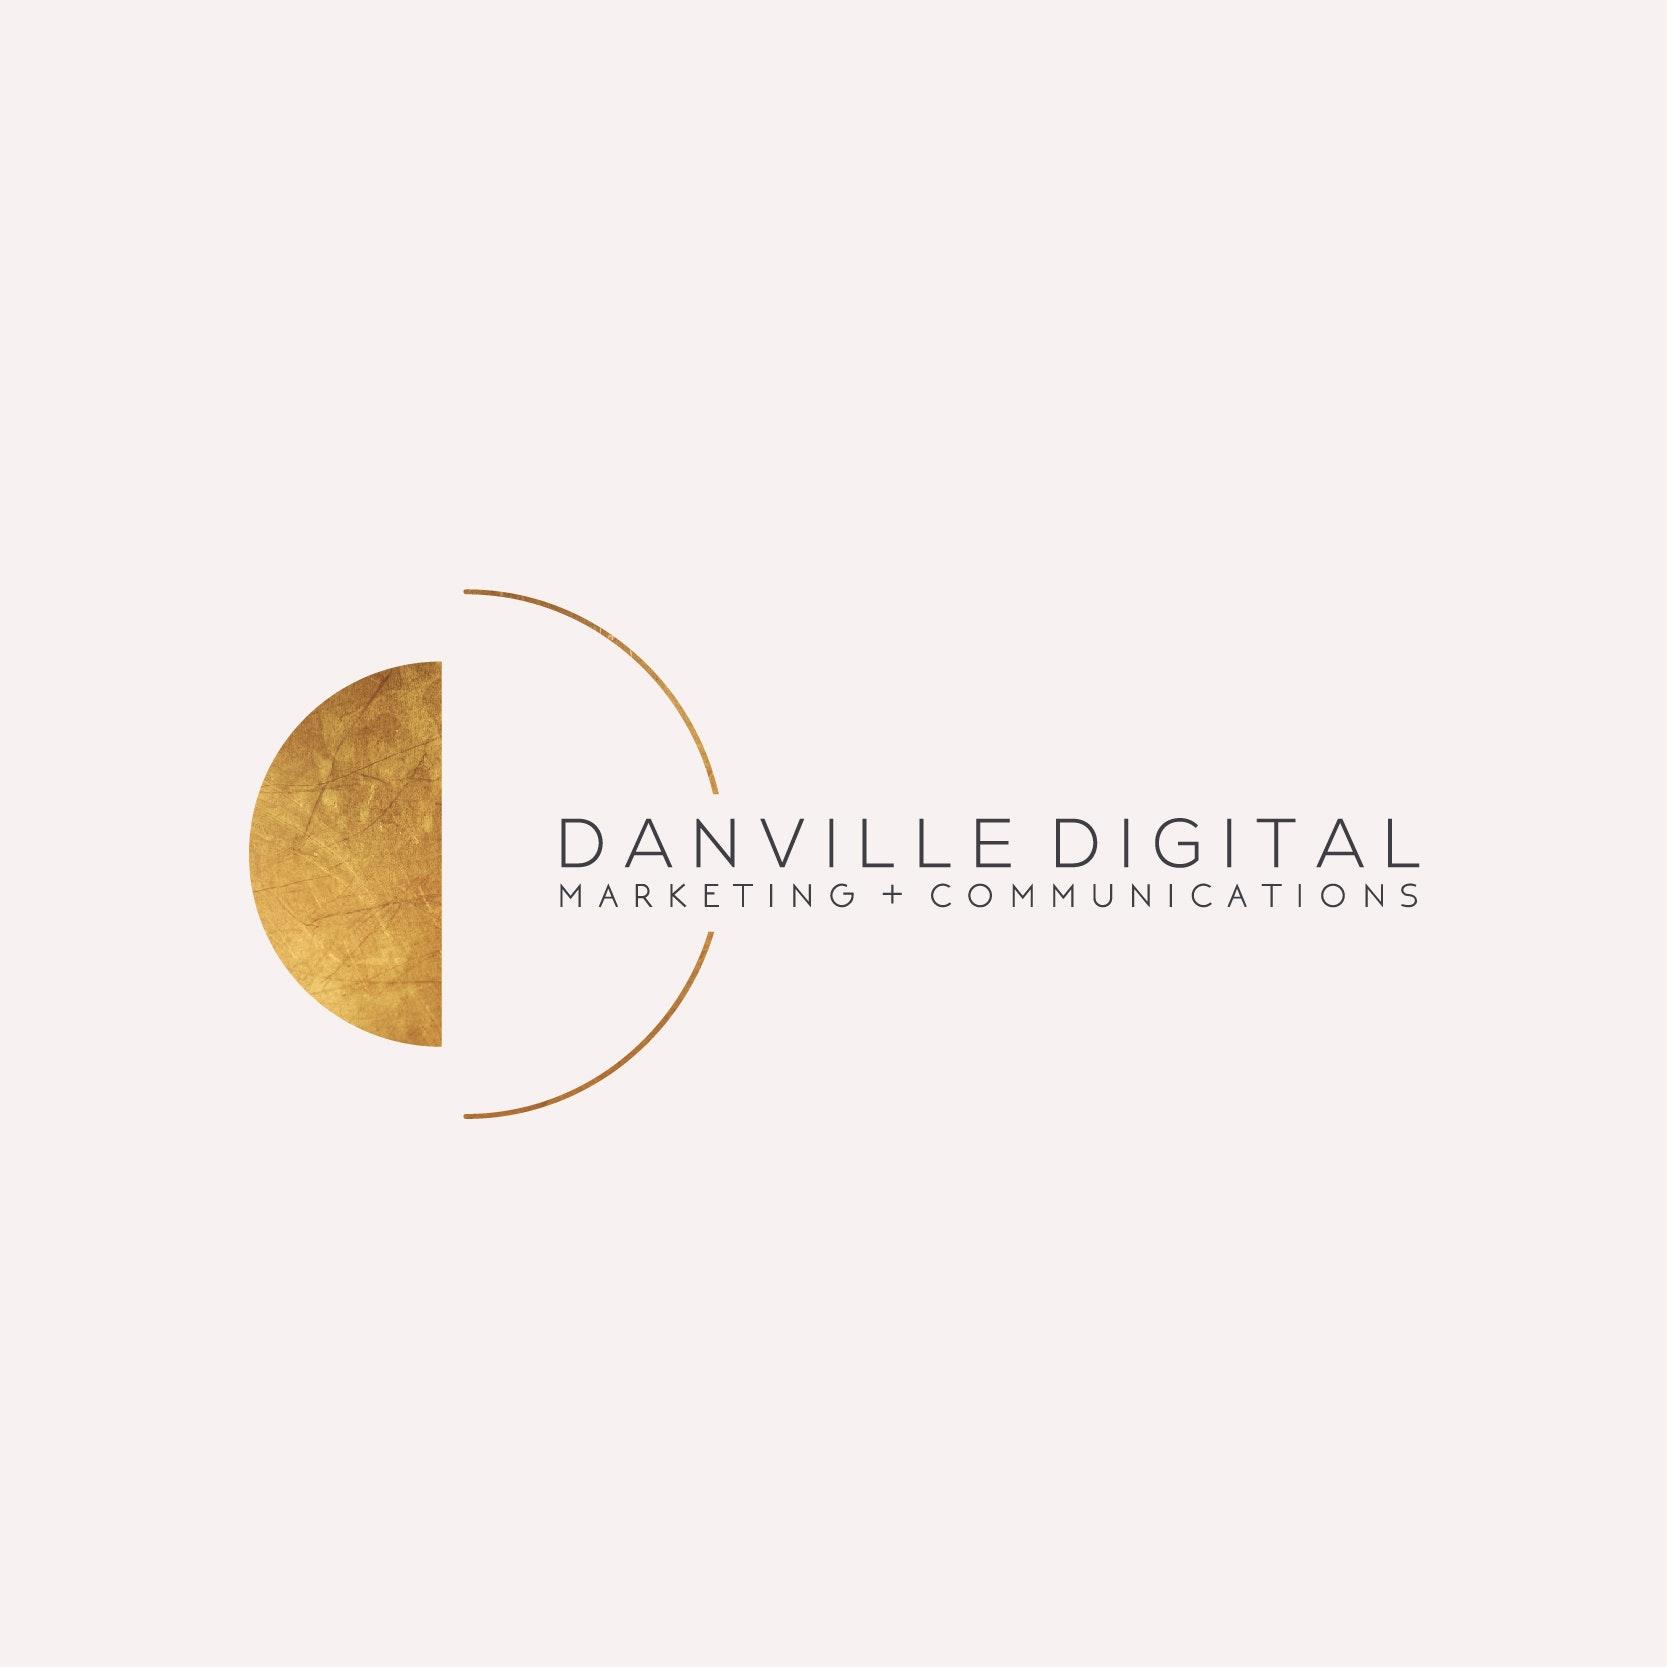 Danville Digital logo